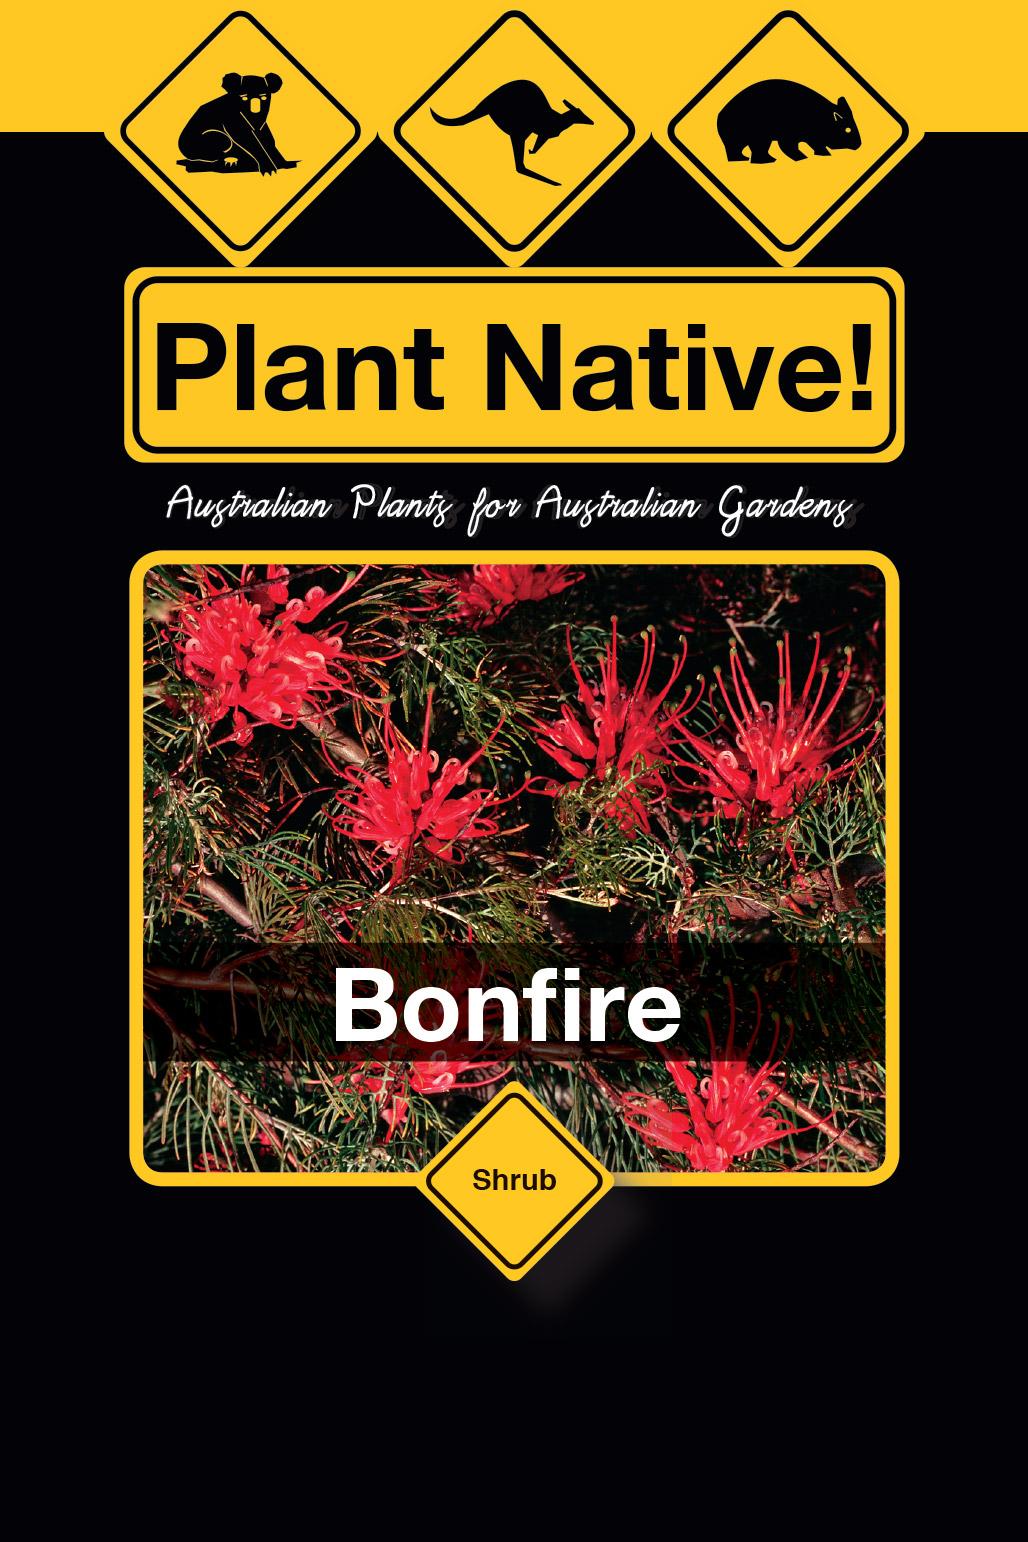 Bonfire - Plant Native!